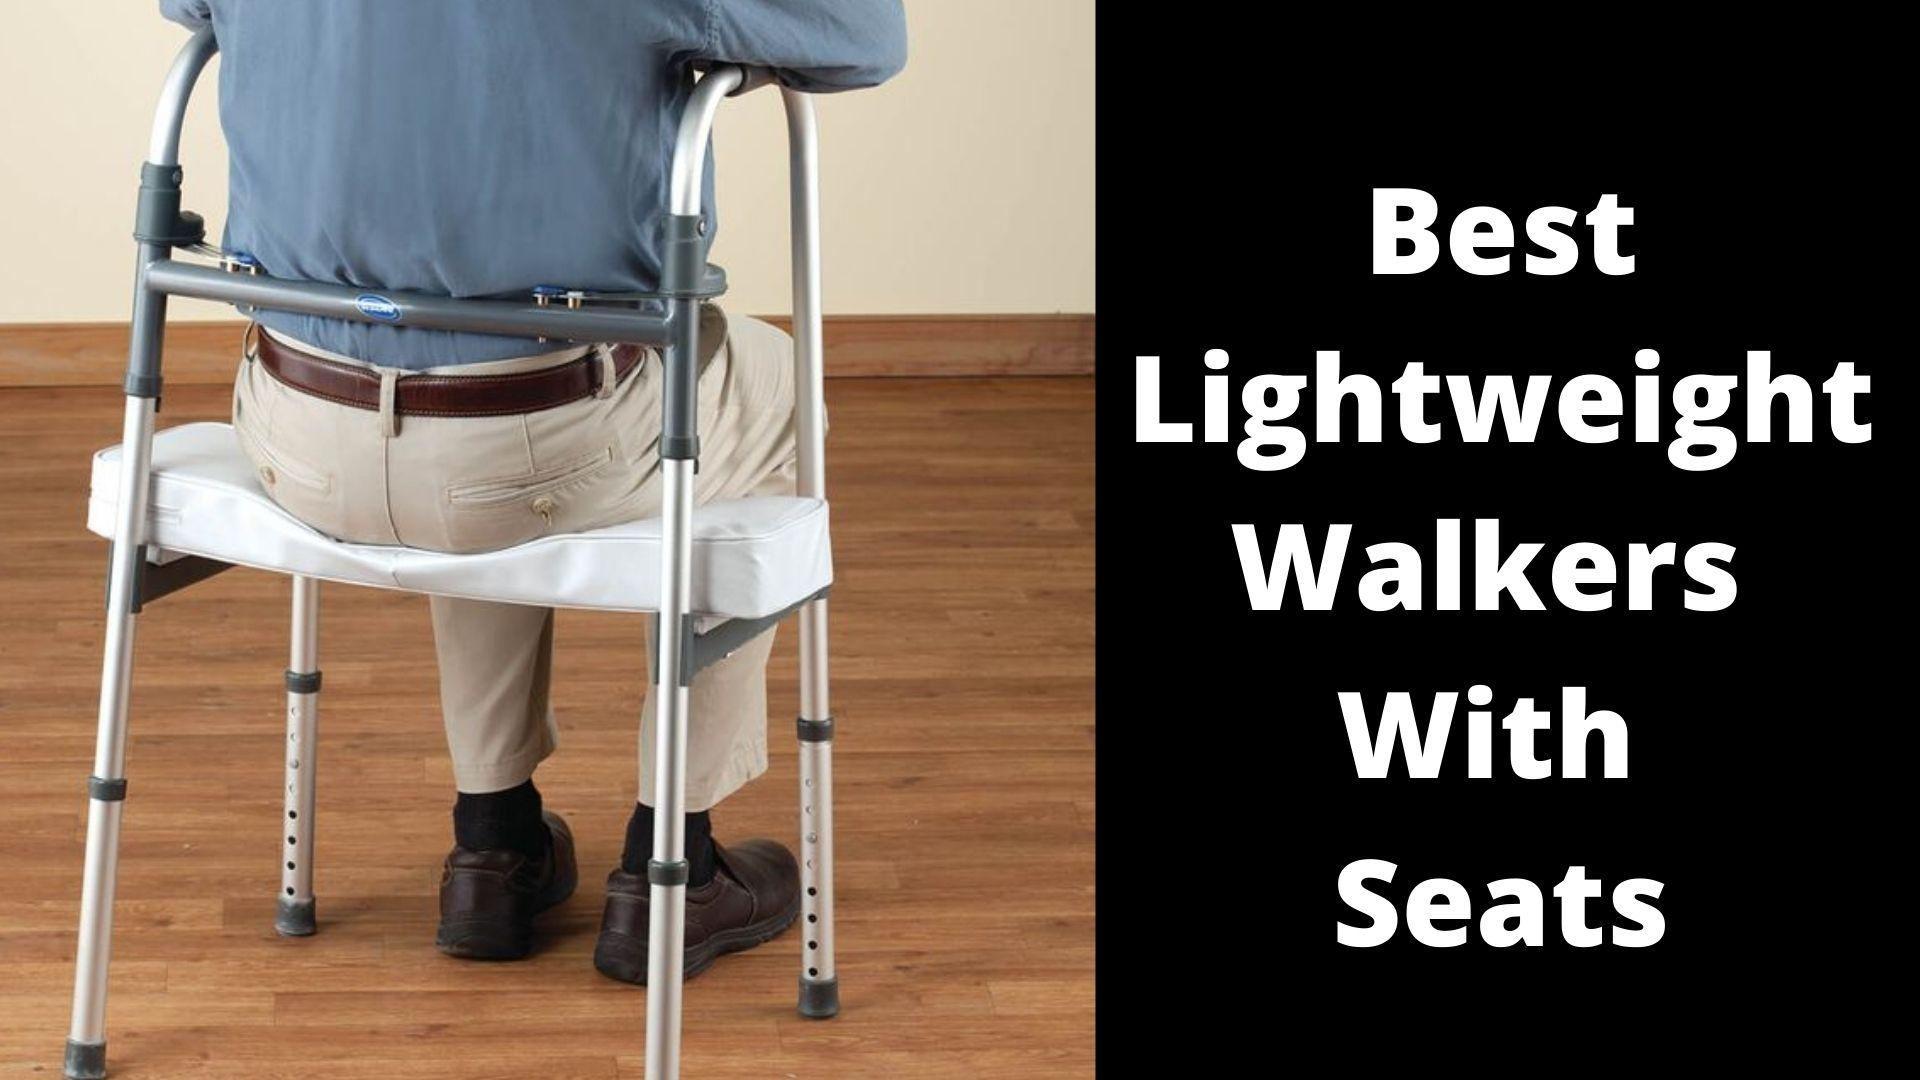 Best Lightweight Walkers With Seats